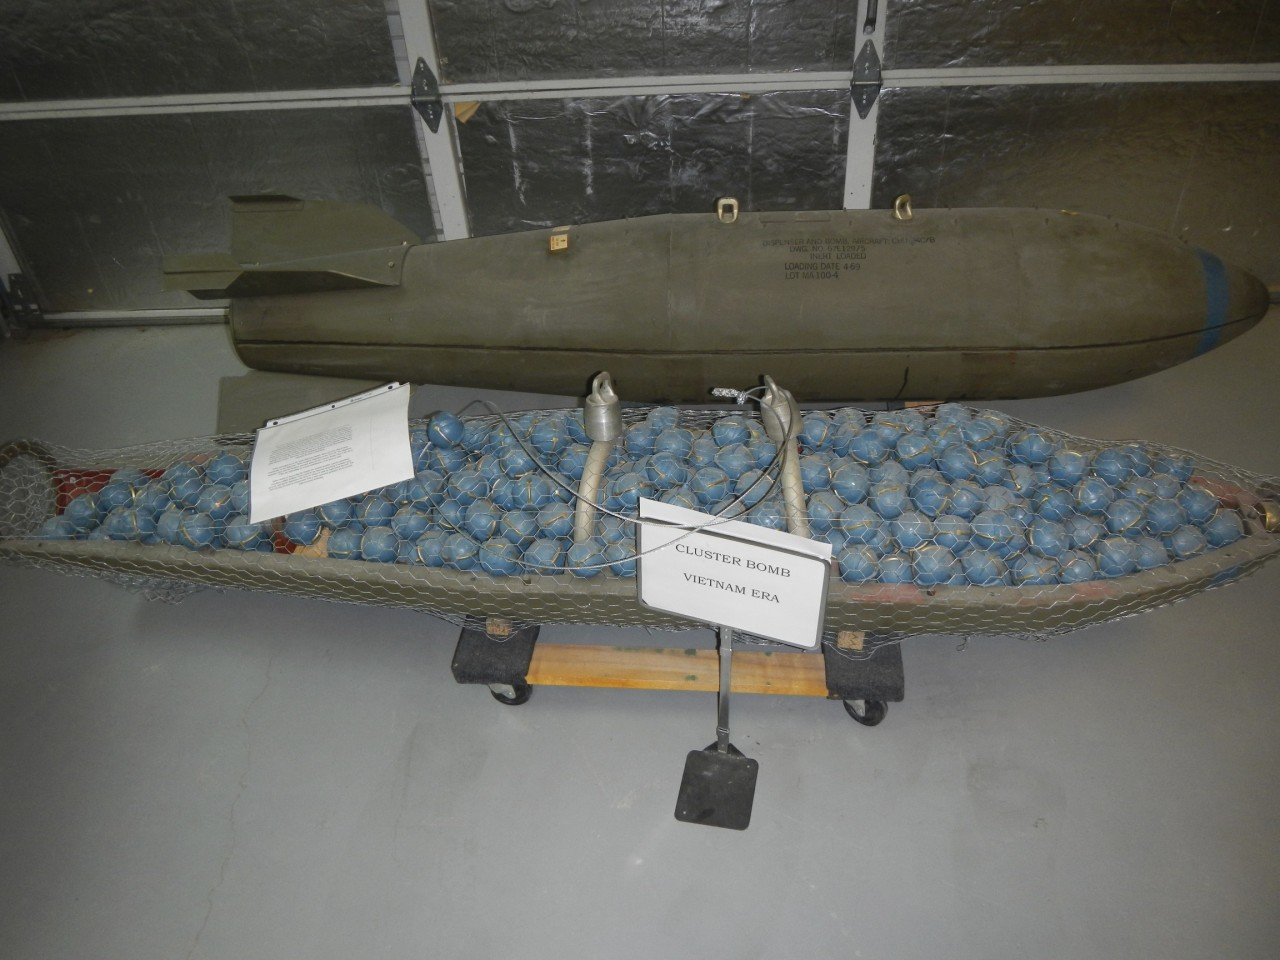 Vietnam Era Cluster Bomb